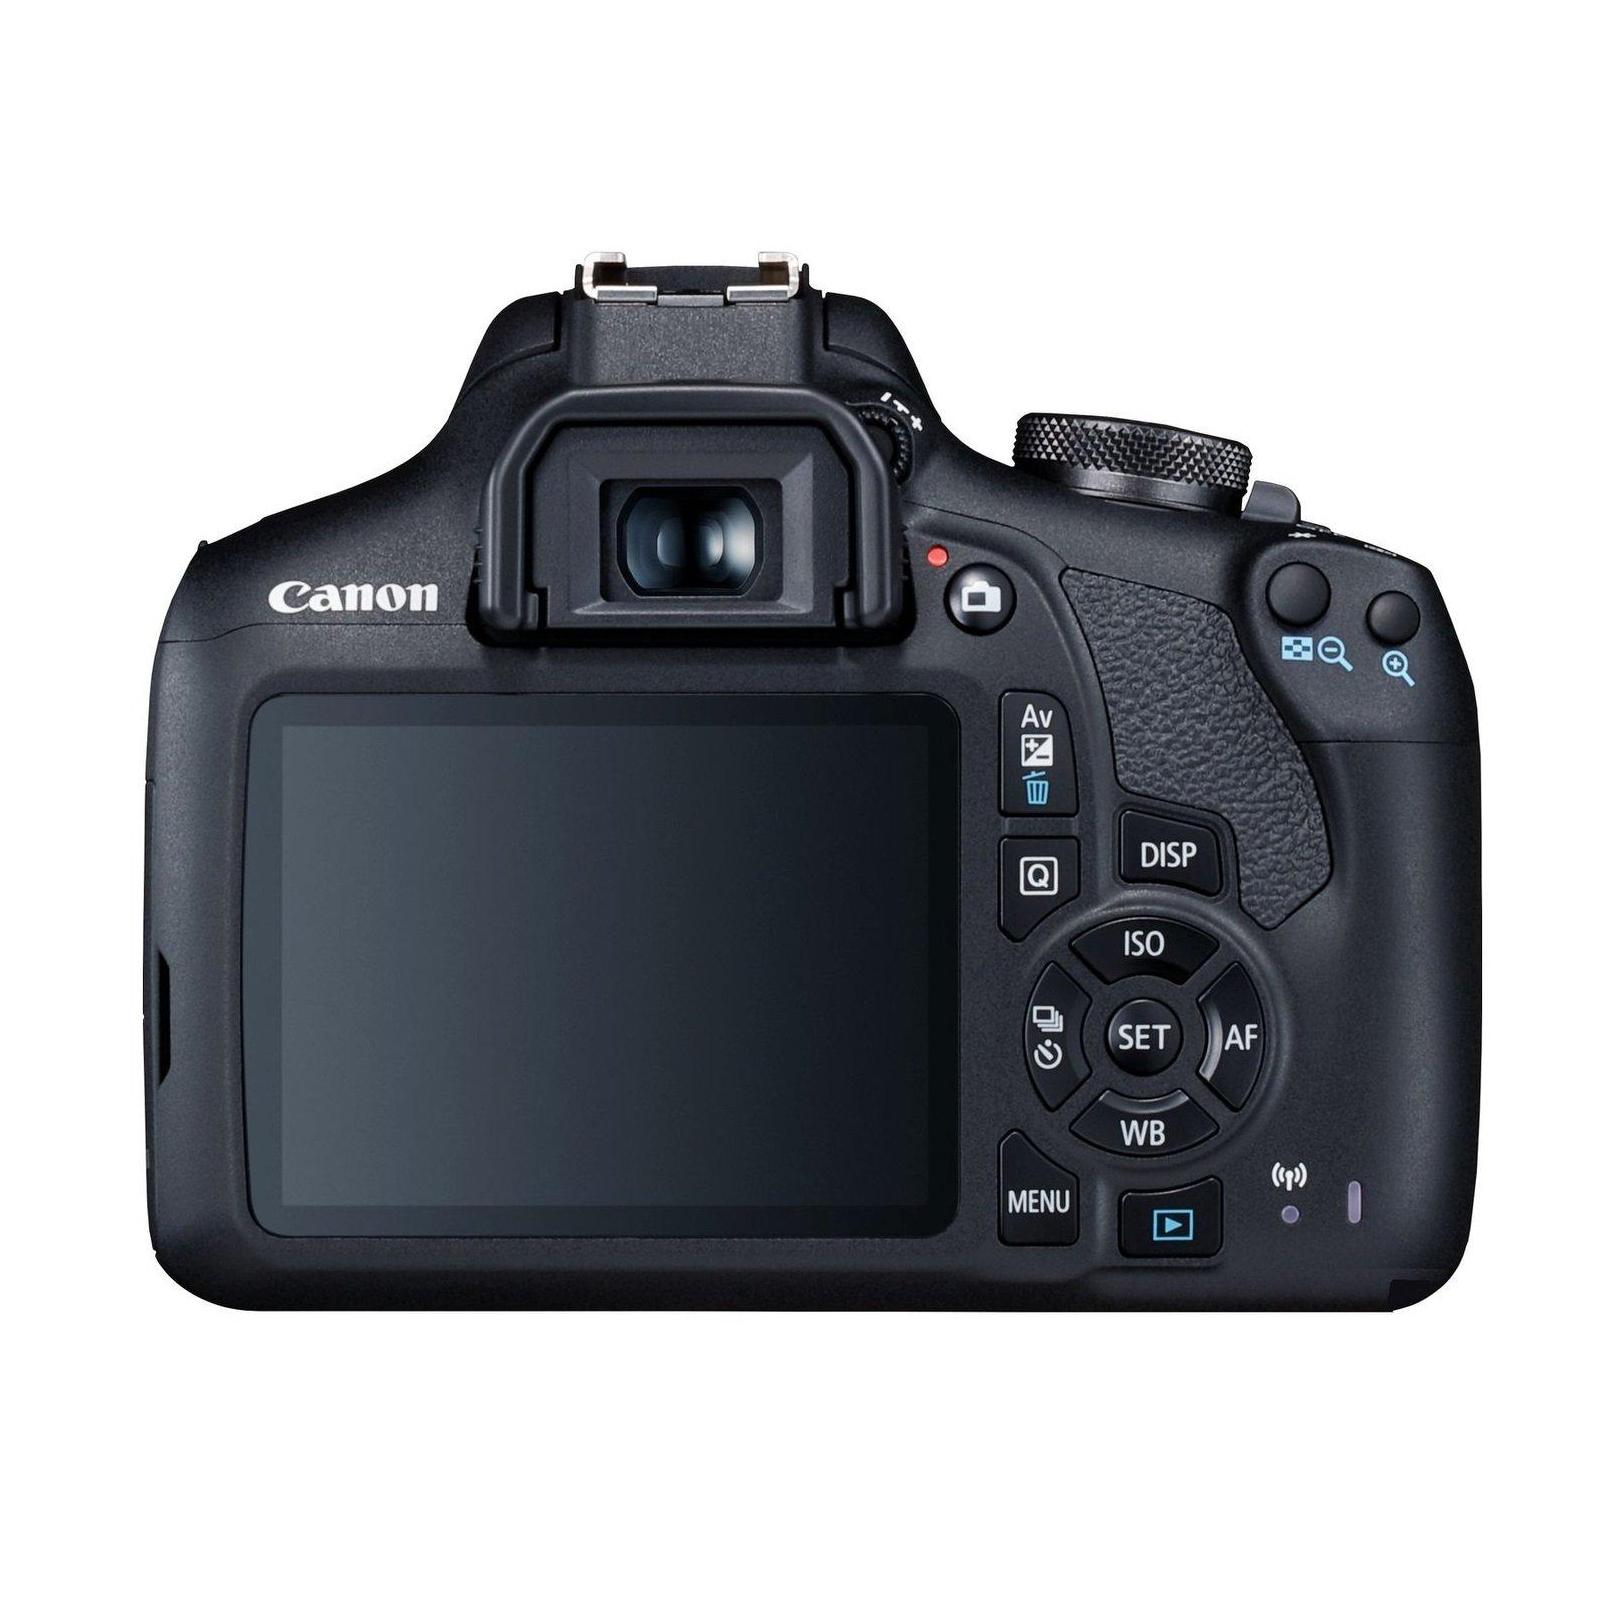 Цифровой фотоаппарат Canon EOS 2000D 18-55 IS II kit (2728C008) изображение 3